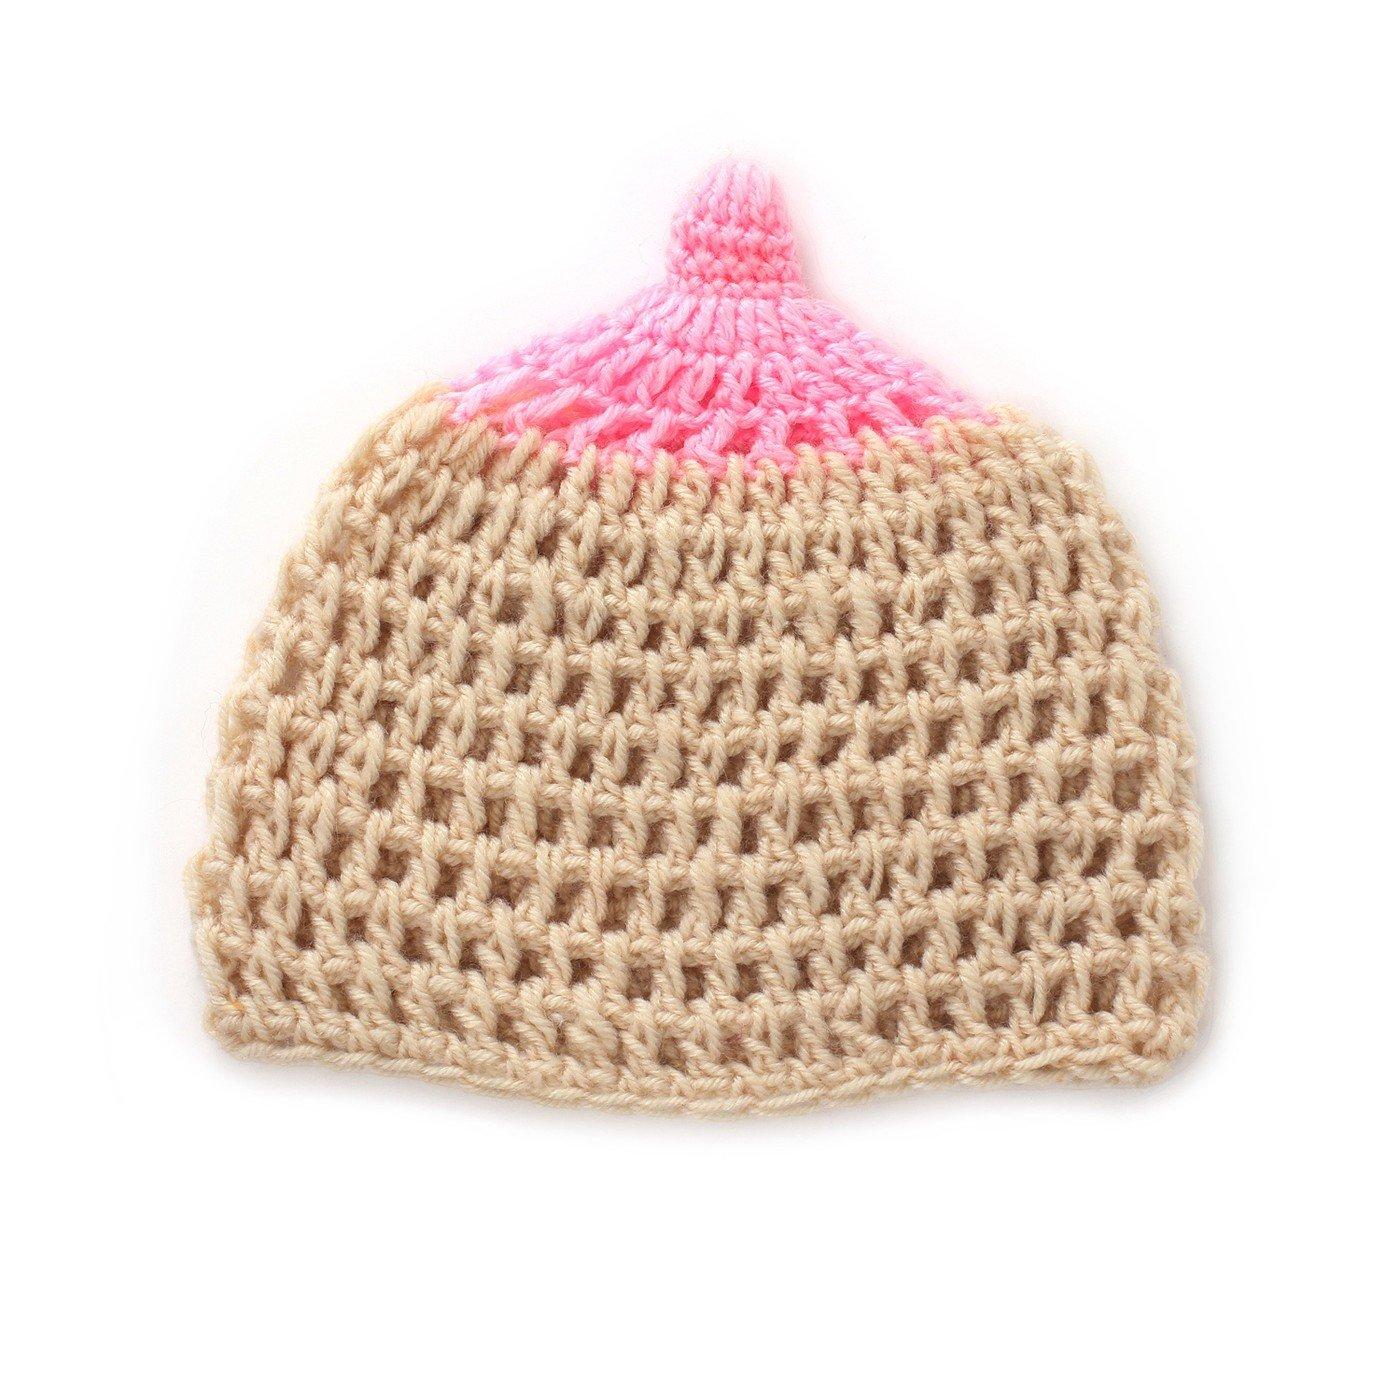 Youngate Newborn Baby Girls Lovely Kawaii Knit Weaving Hat Cap Photo Shoot